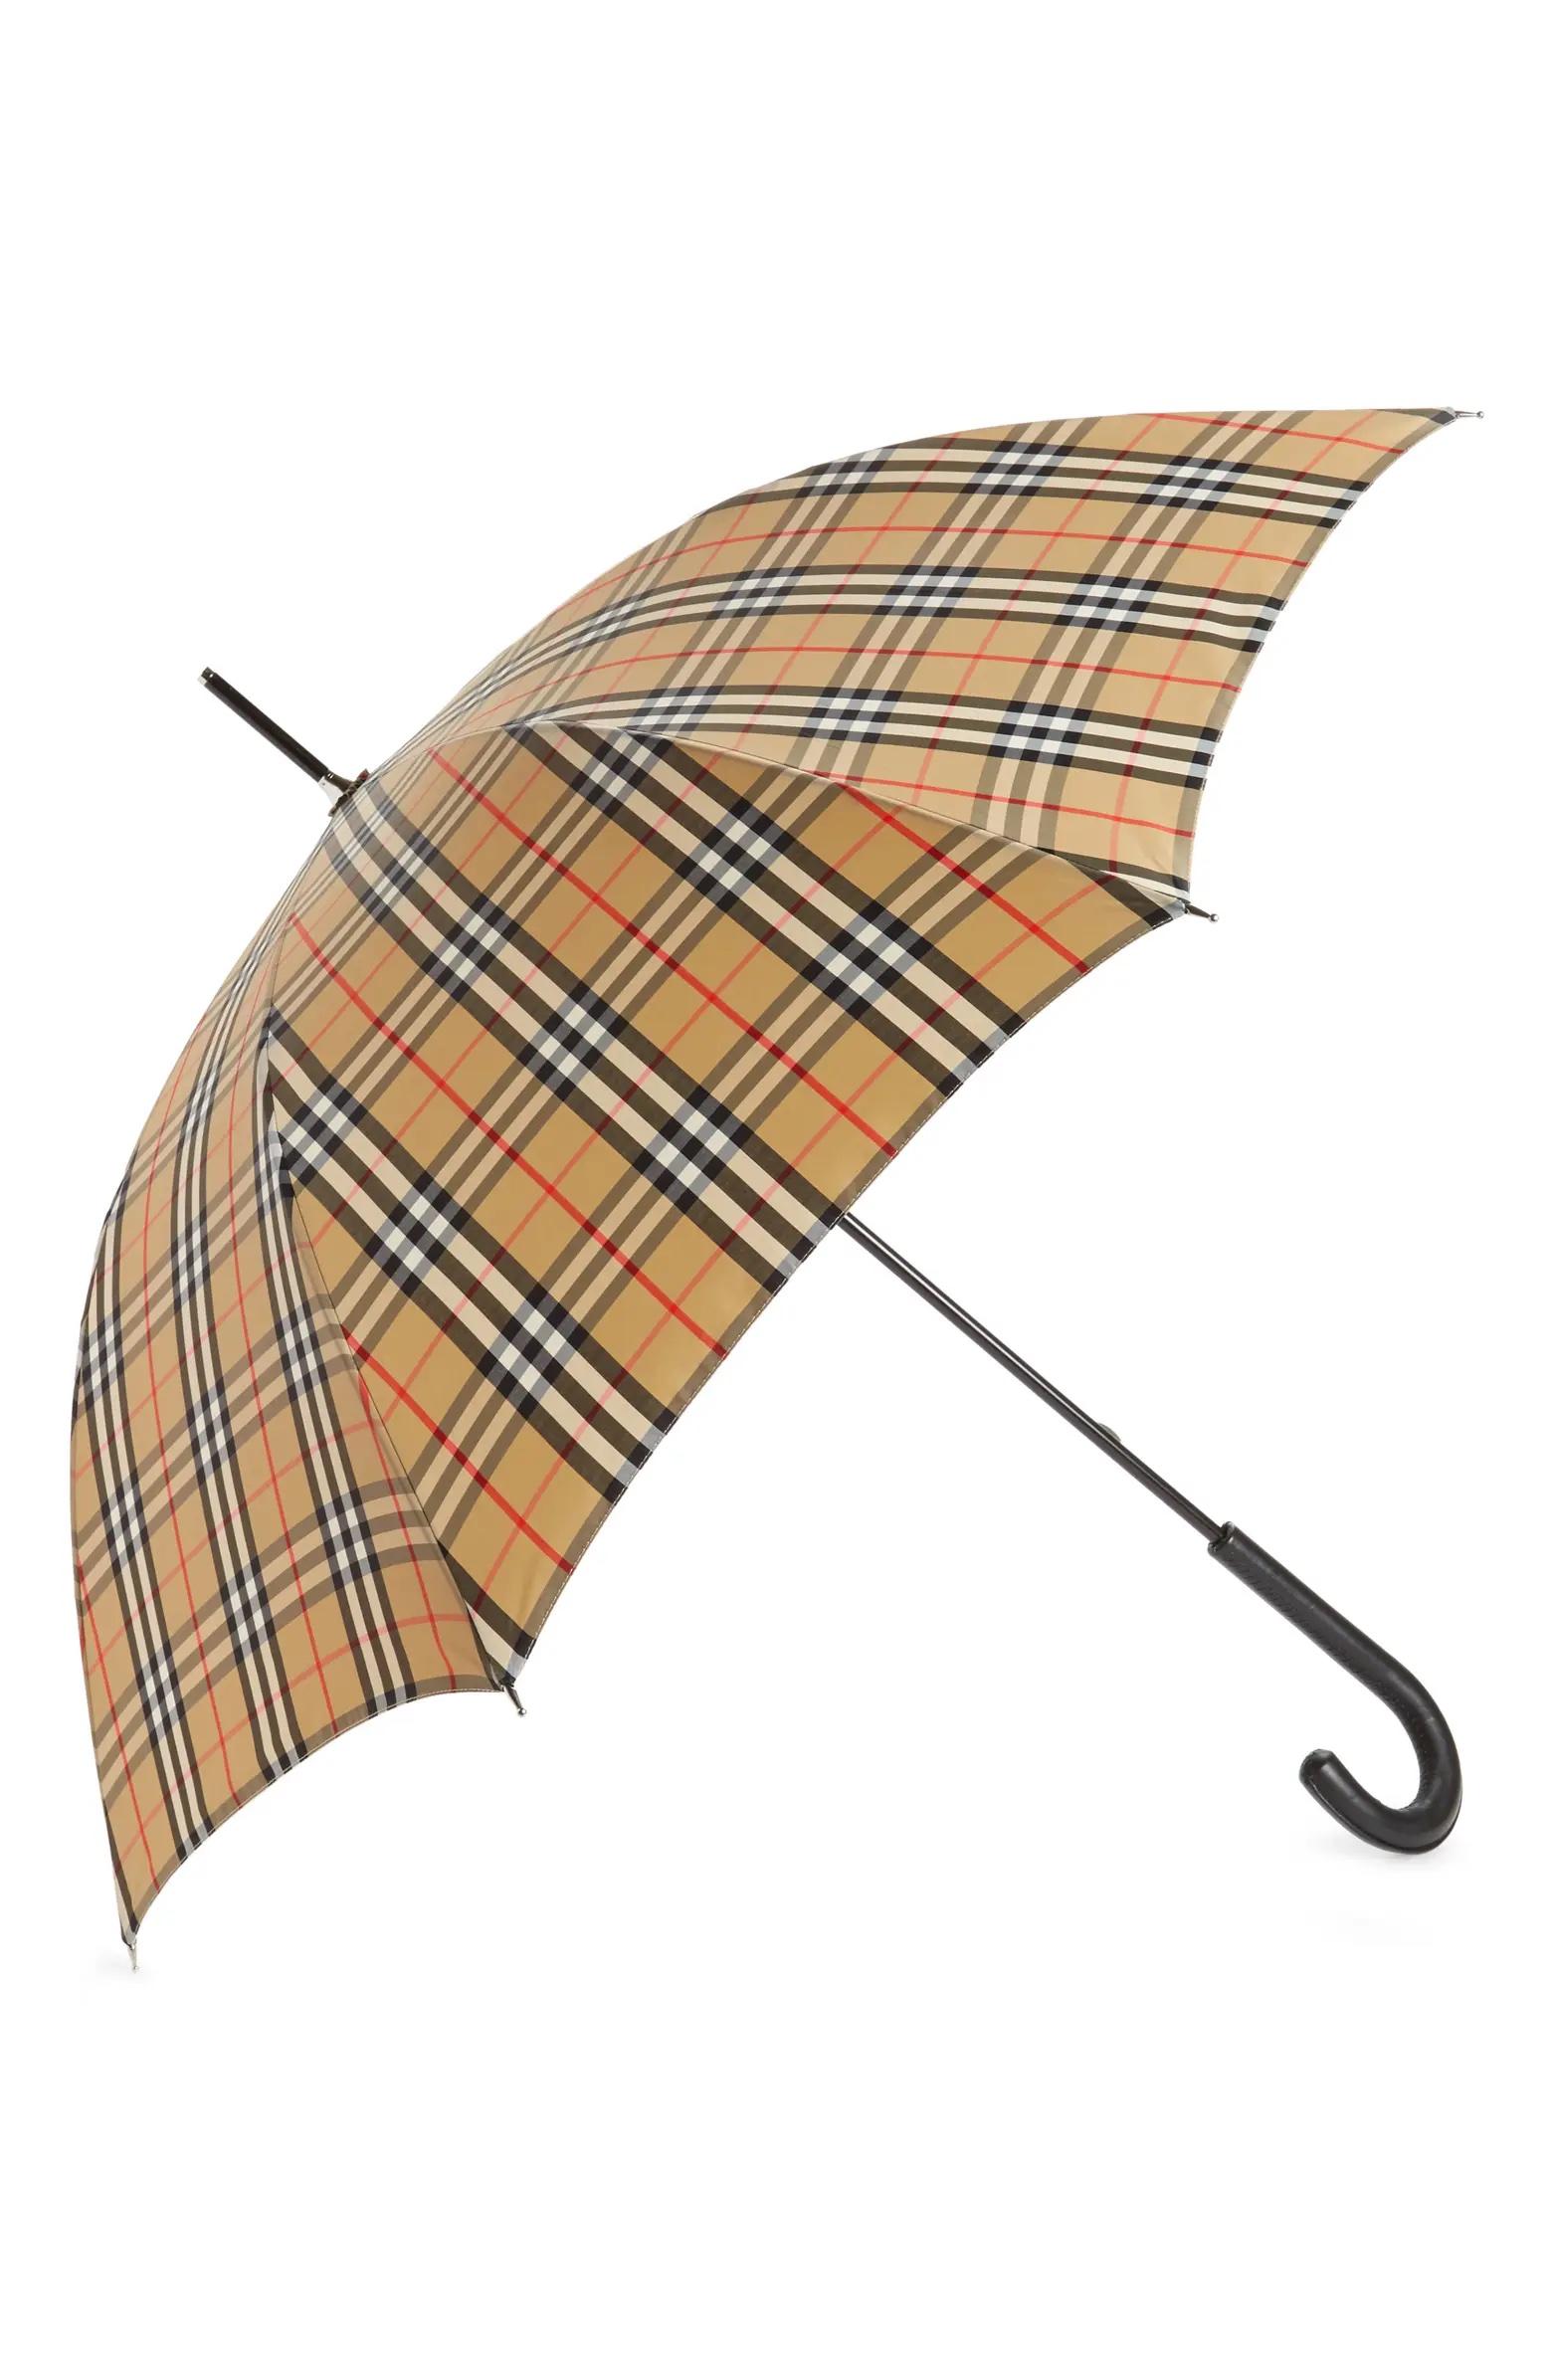 Burberry umbrella.